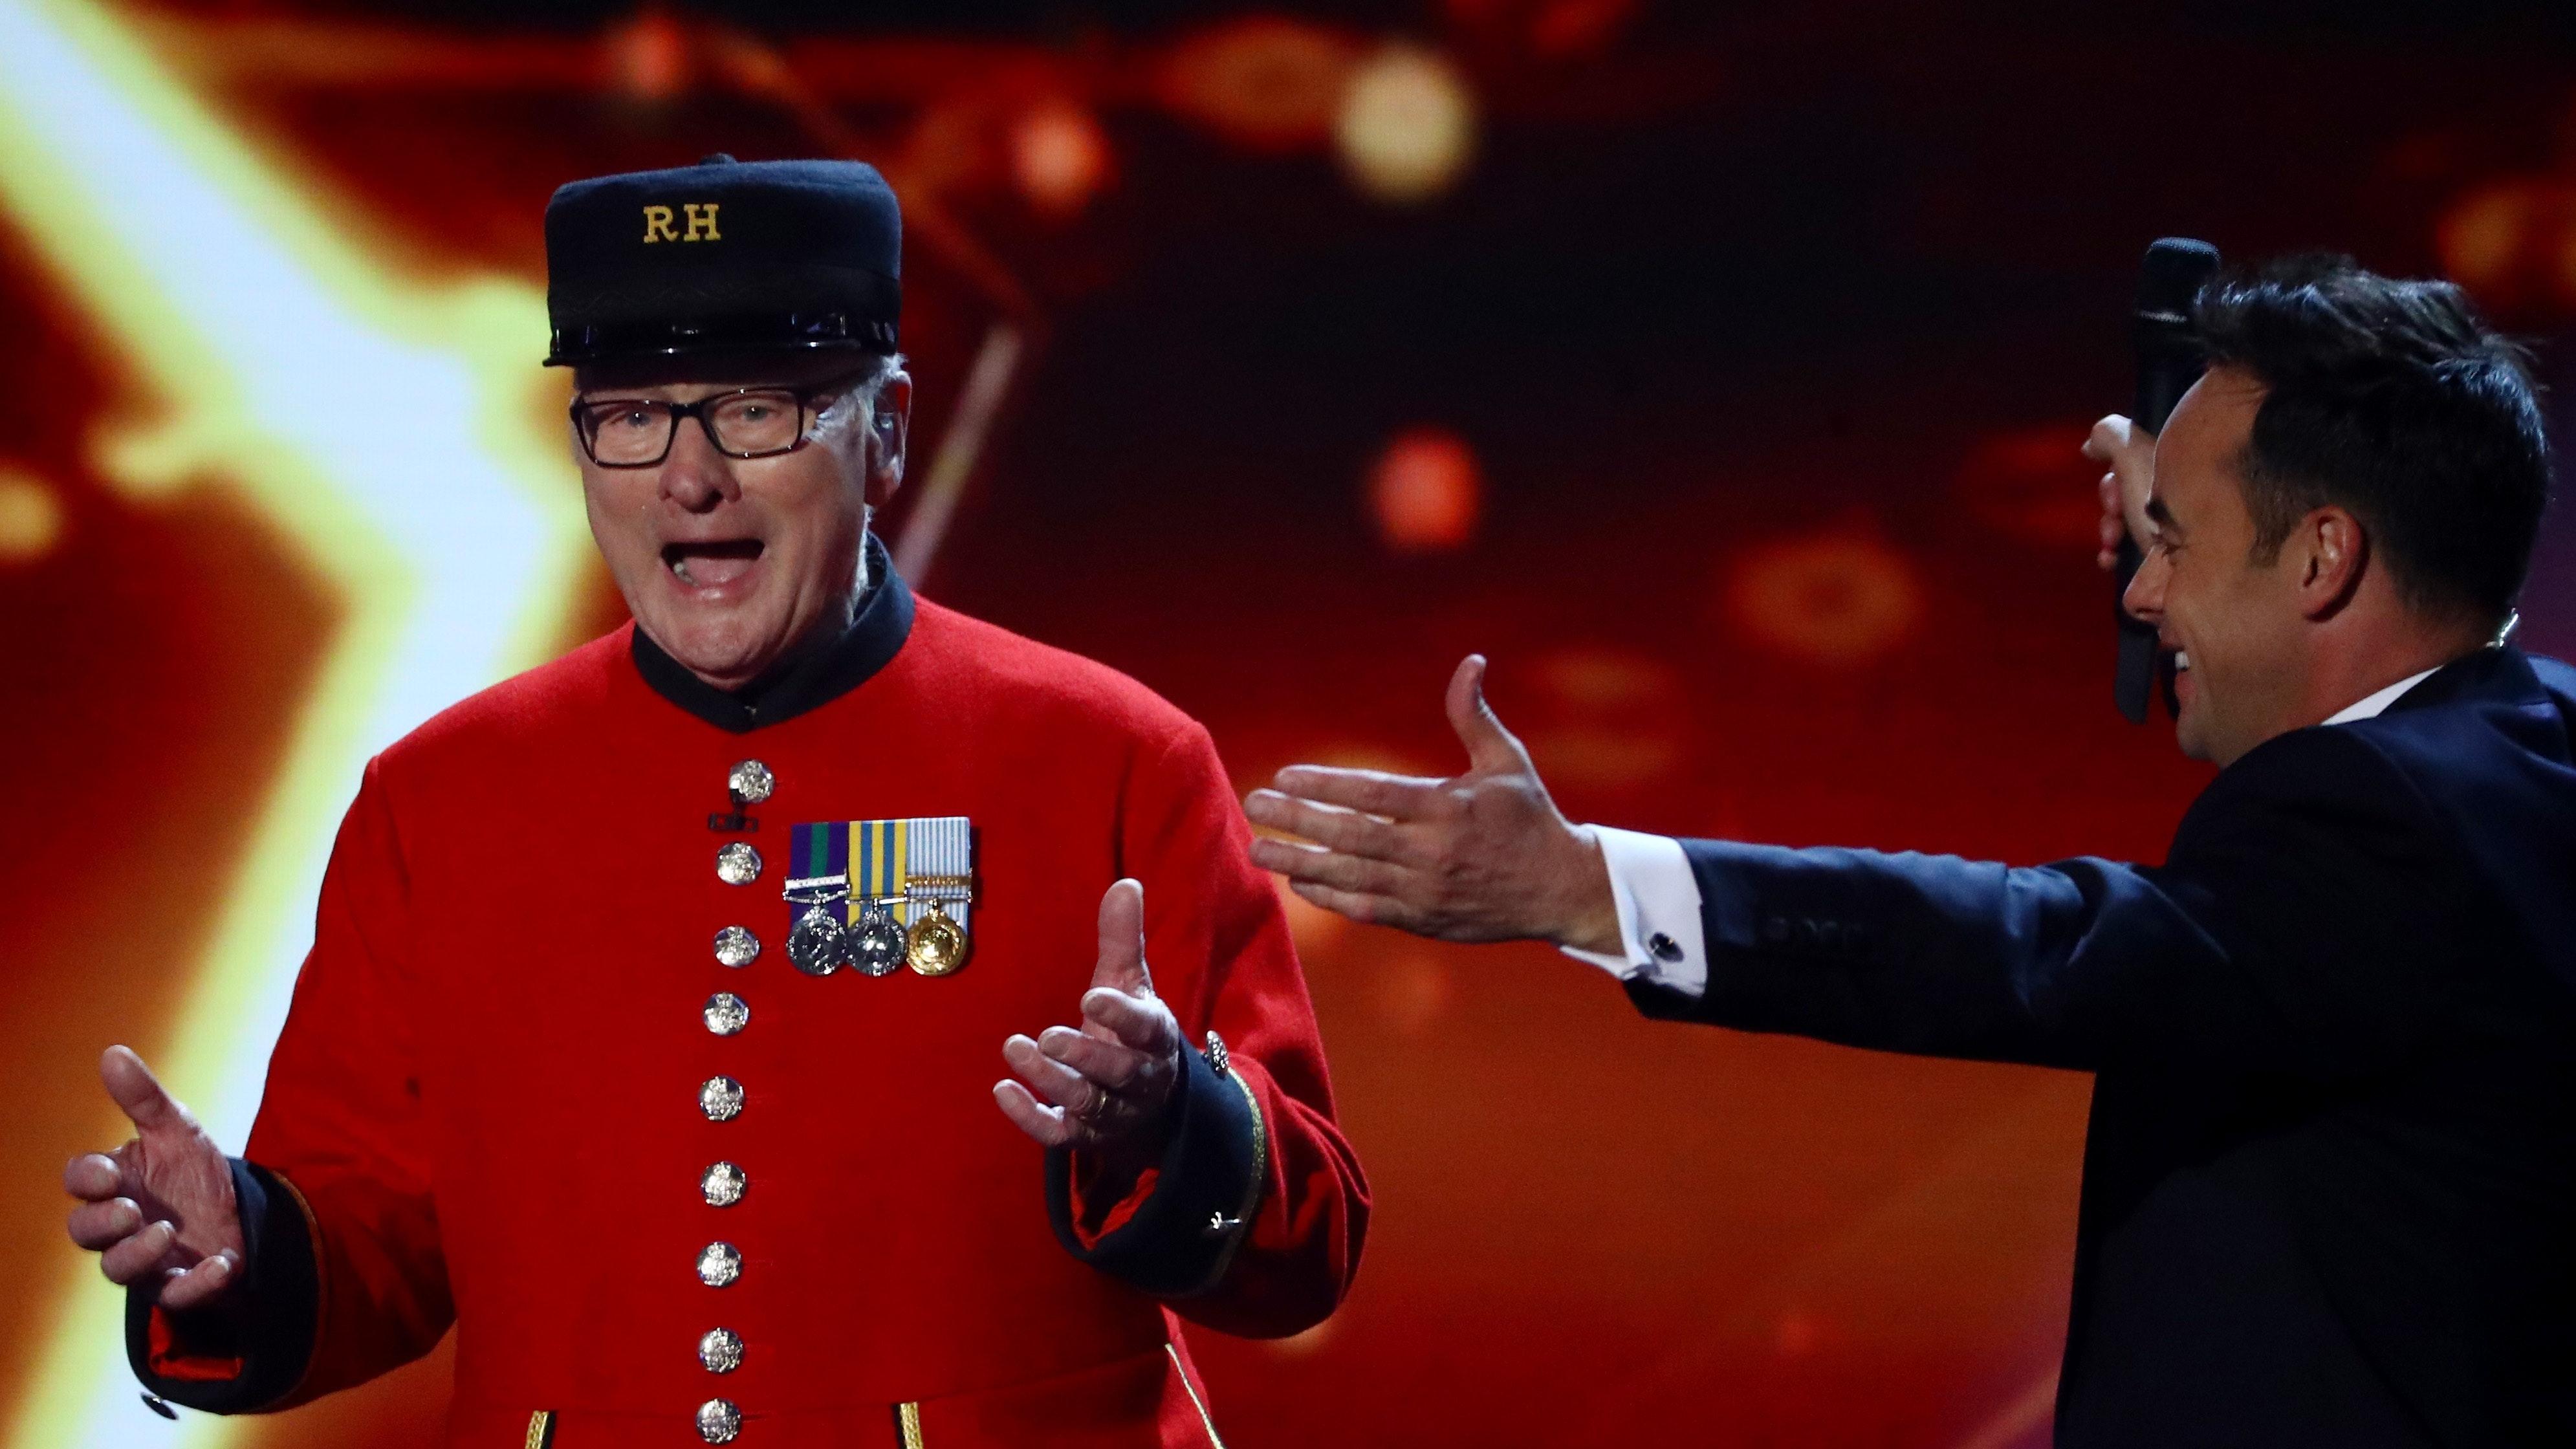 Britain's Got Talent final enjoys ratings high